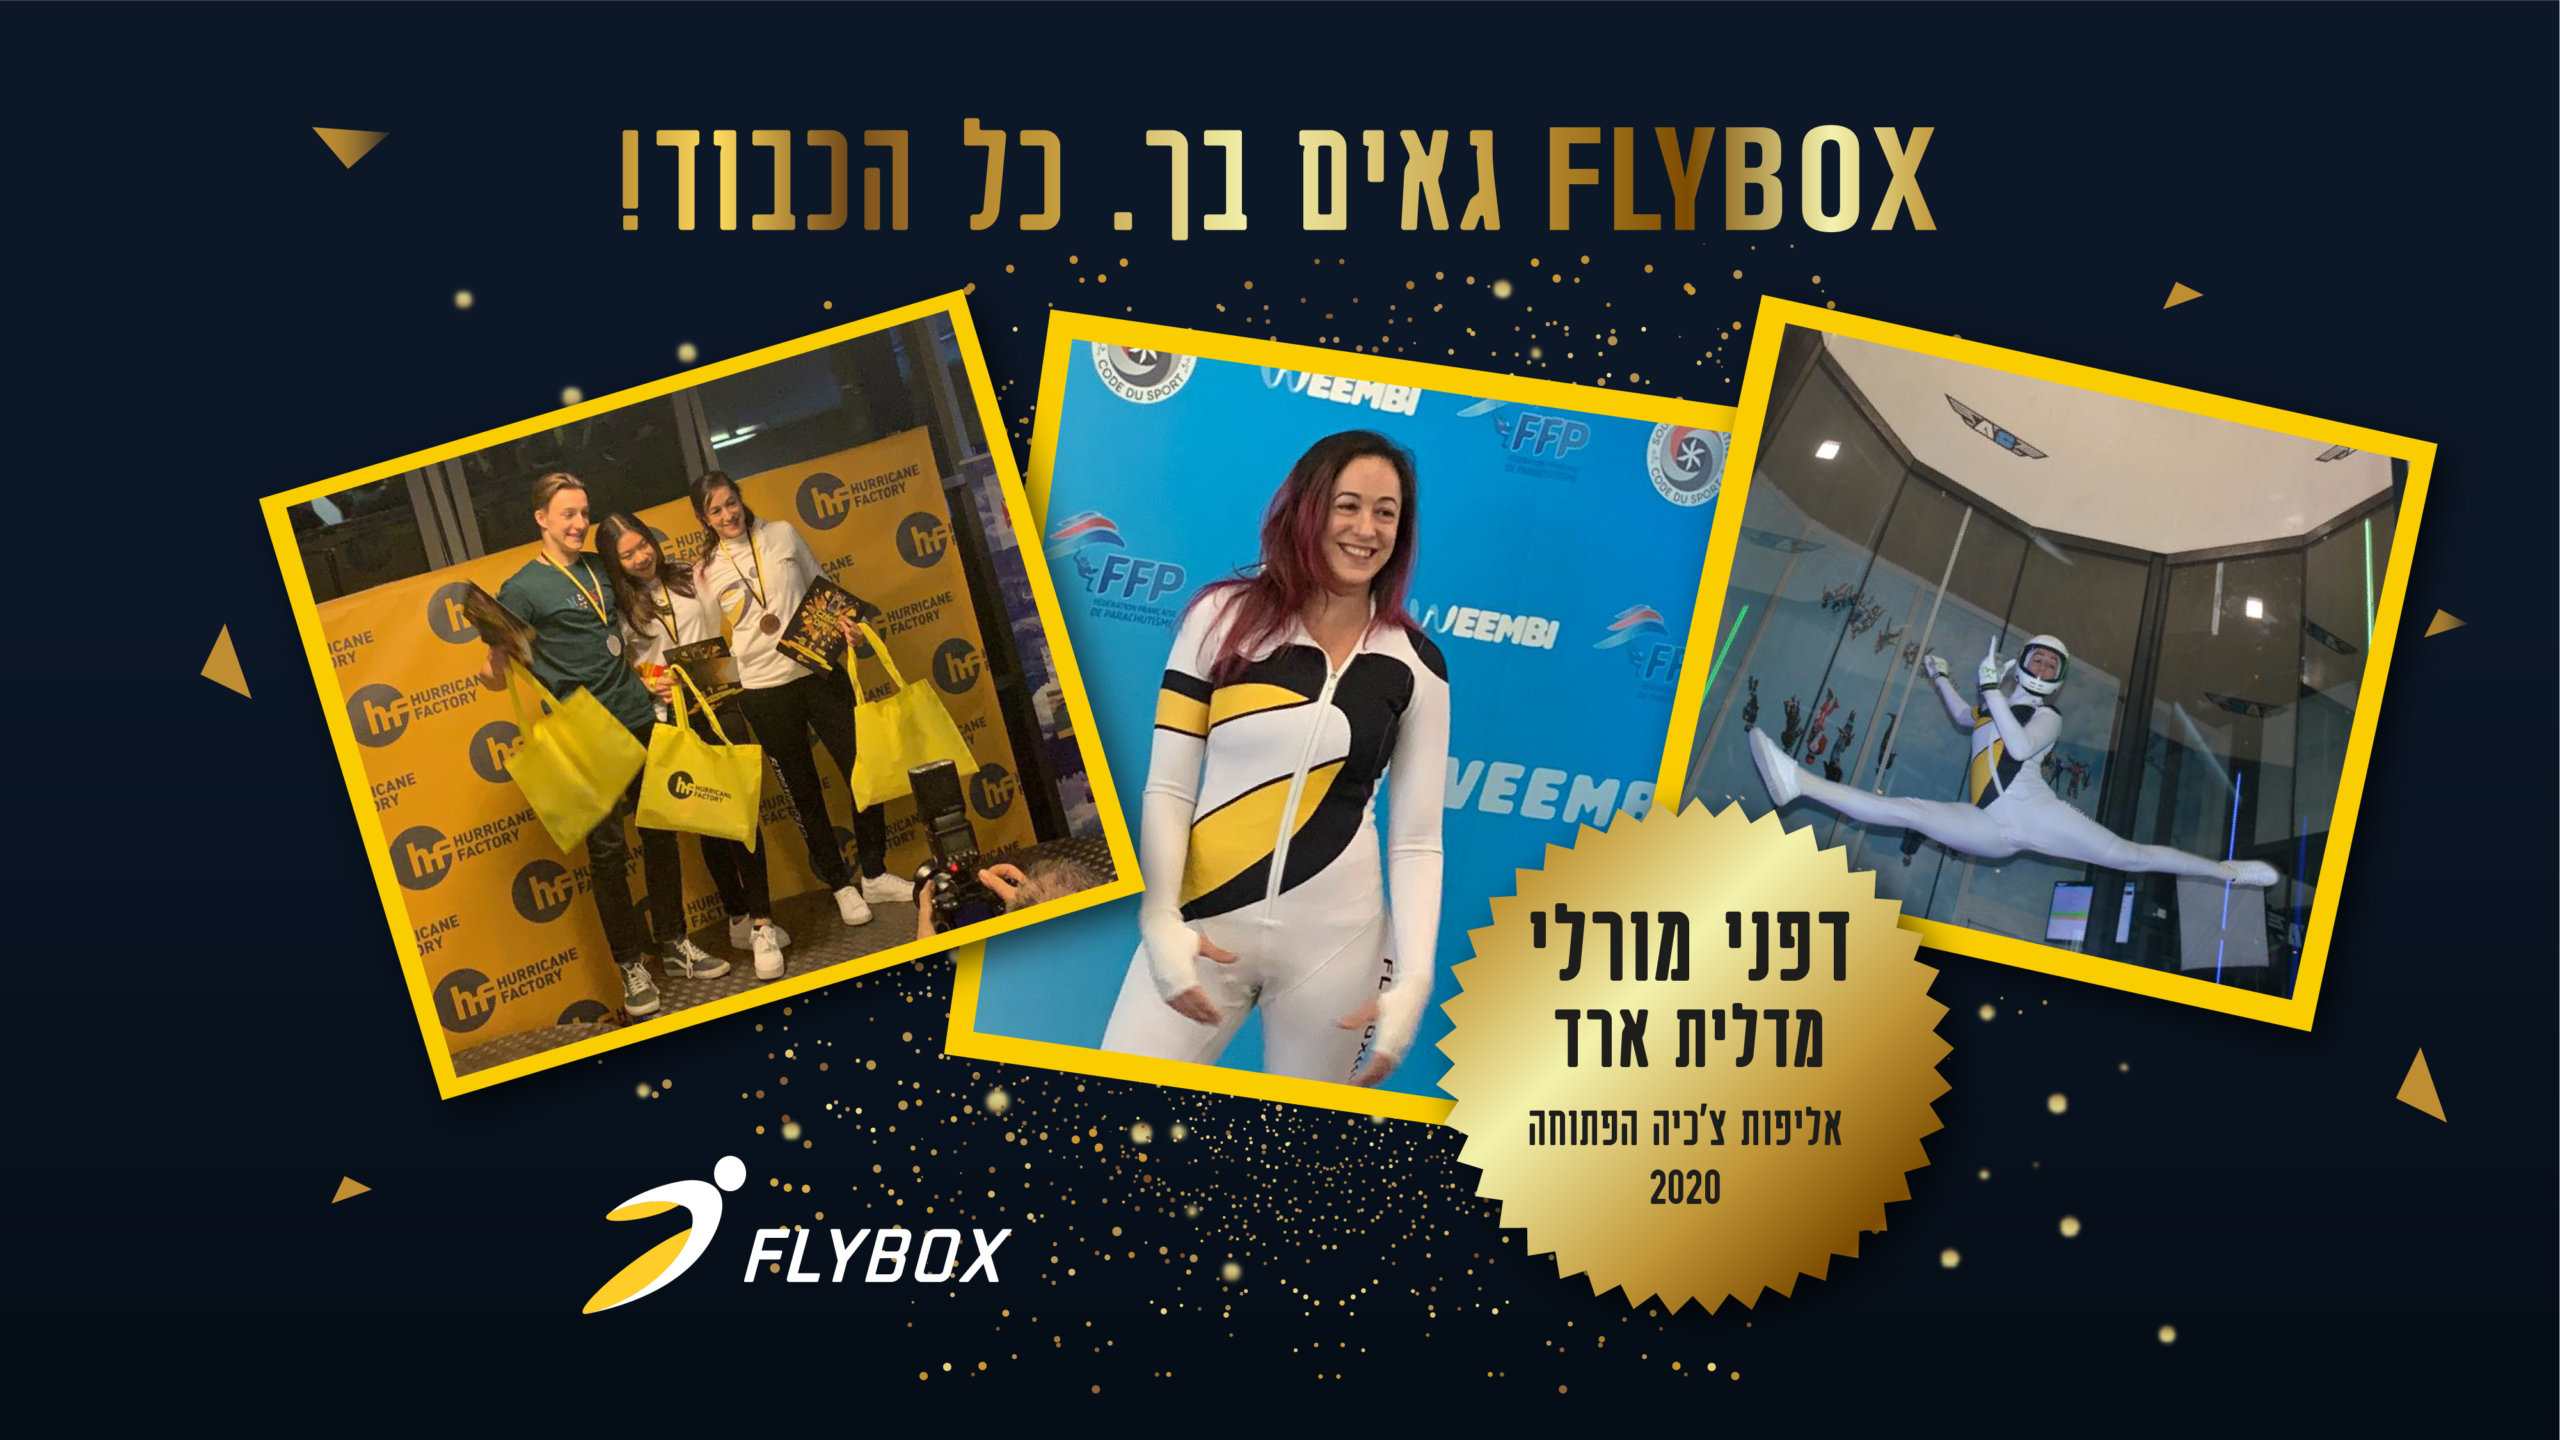 flybox_gali win_SCREEN-03